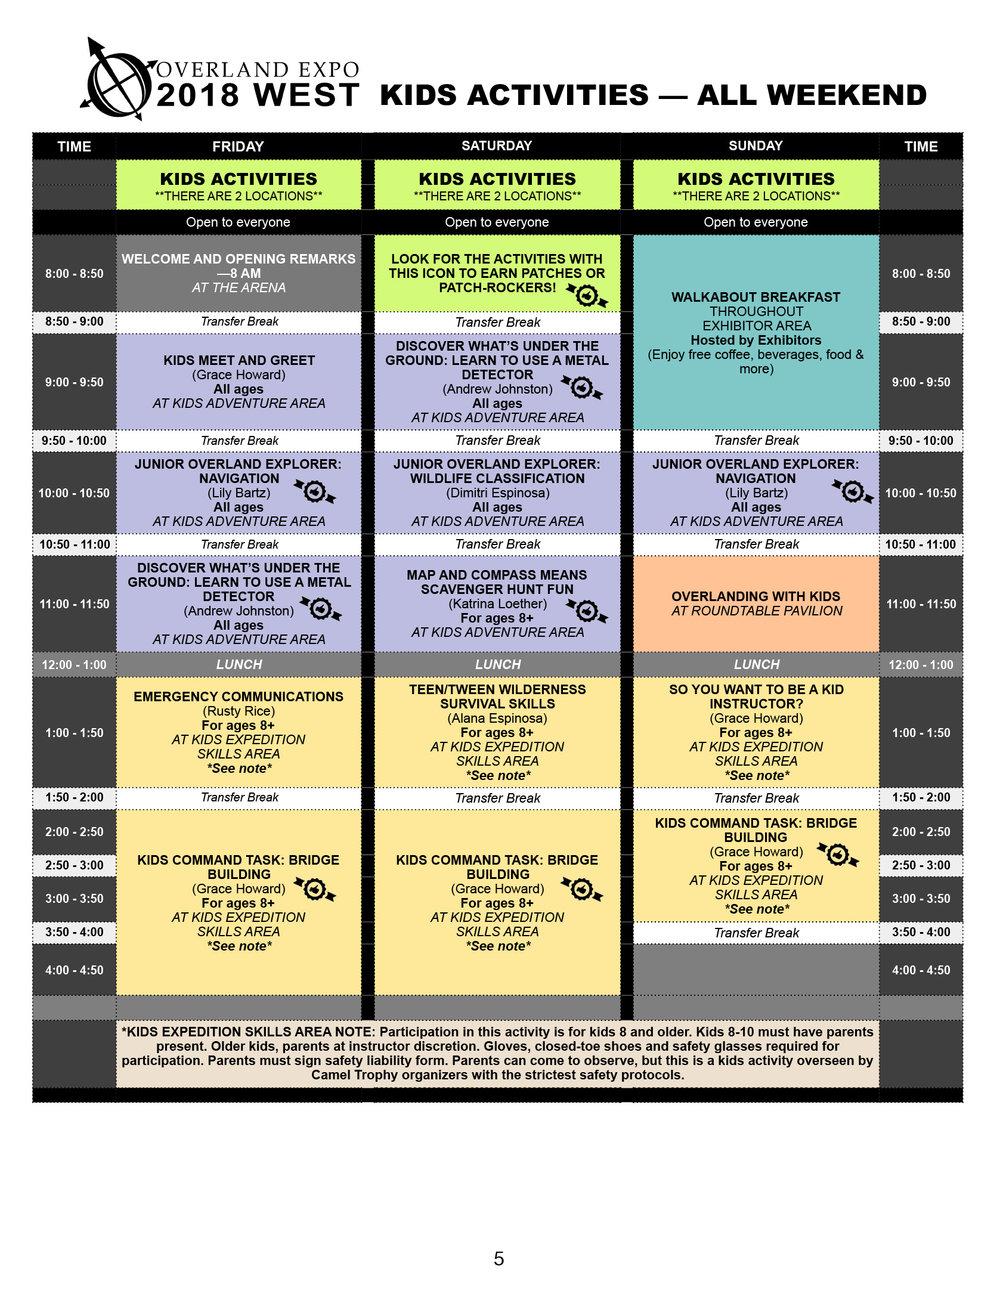 Schedule_OX18W_Weekend & Day Pass-5.jpg